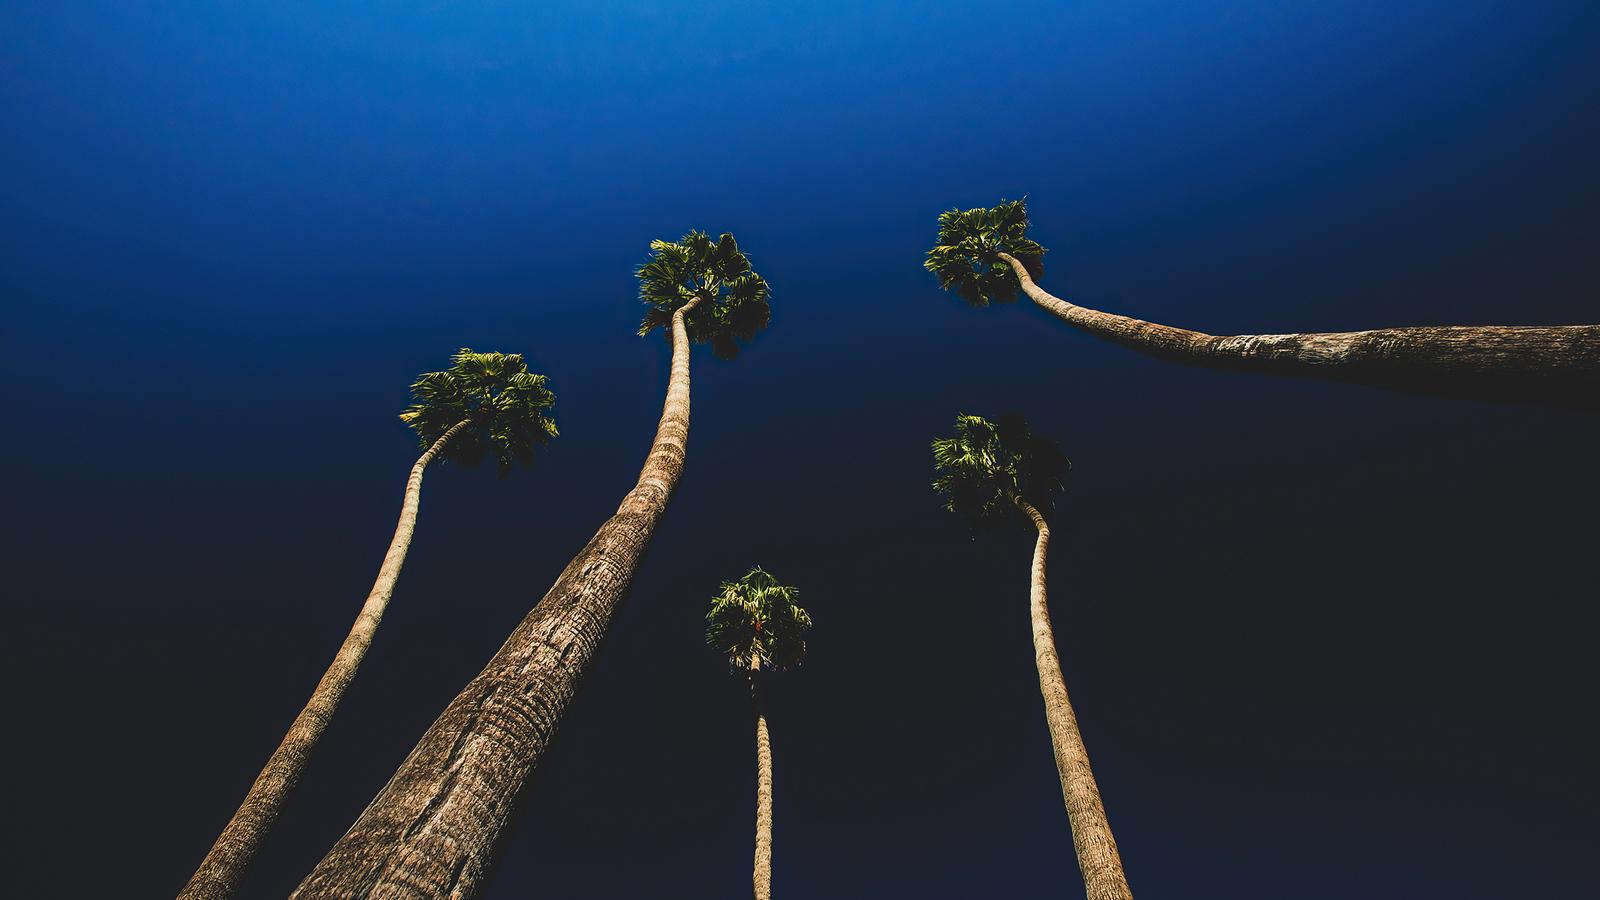 california-palm-trees-ul.jpg